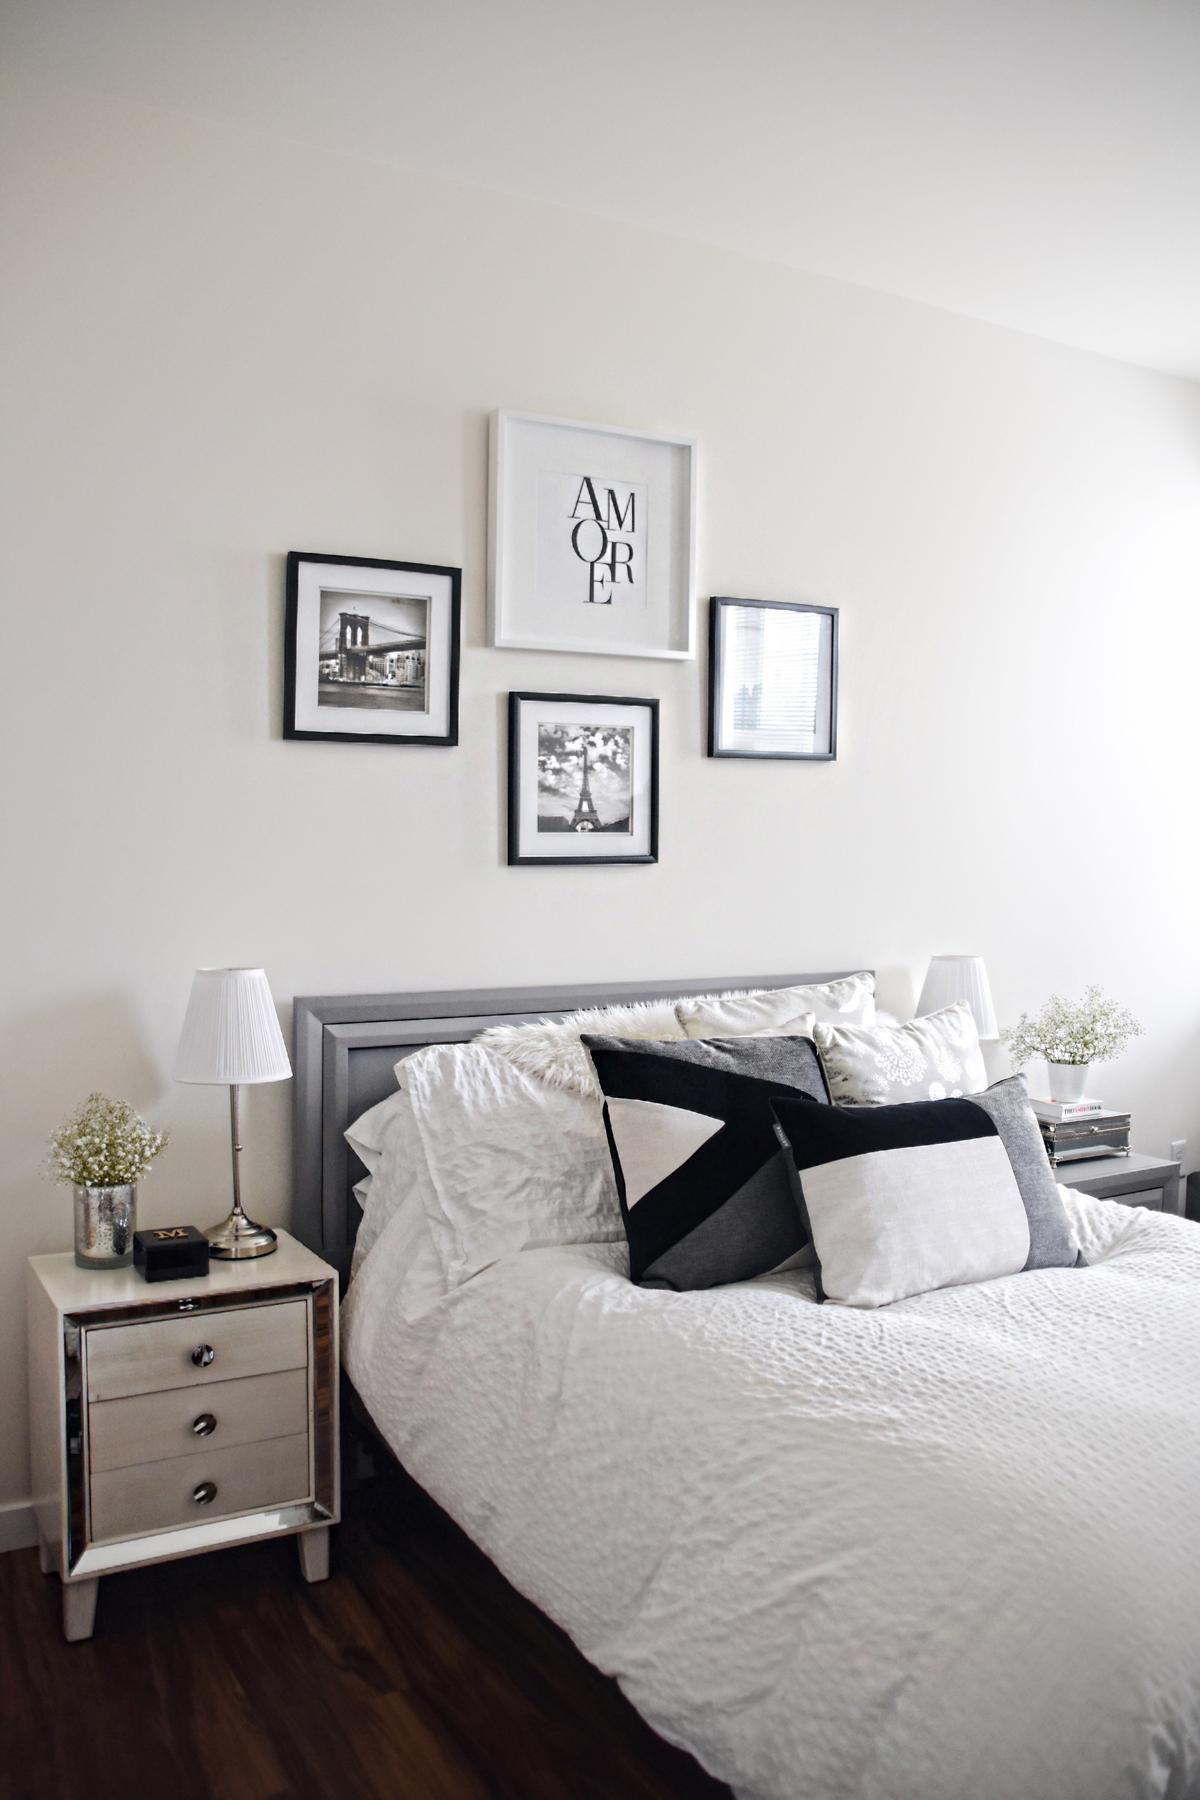 Gracious Article Talk Article Home Decor Lanna Throw Bedroom Decor Inspiration Bedroom Decor Inspiration Article Velu Pillow home decor Article Home Decor